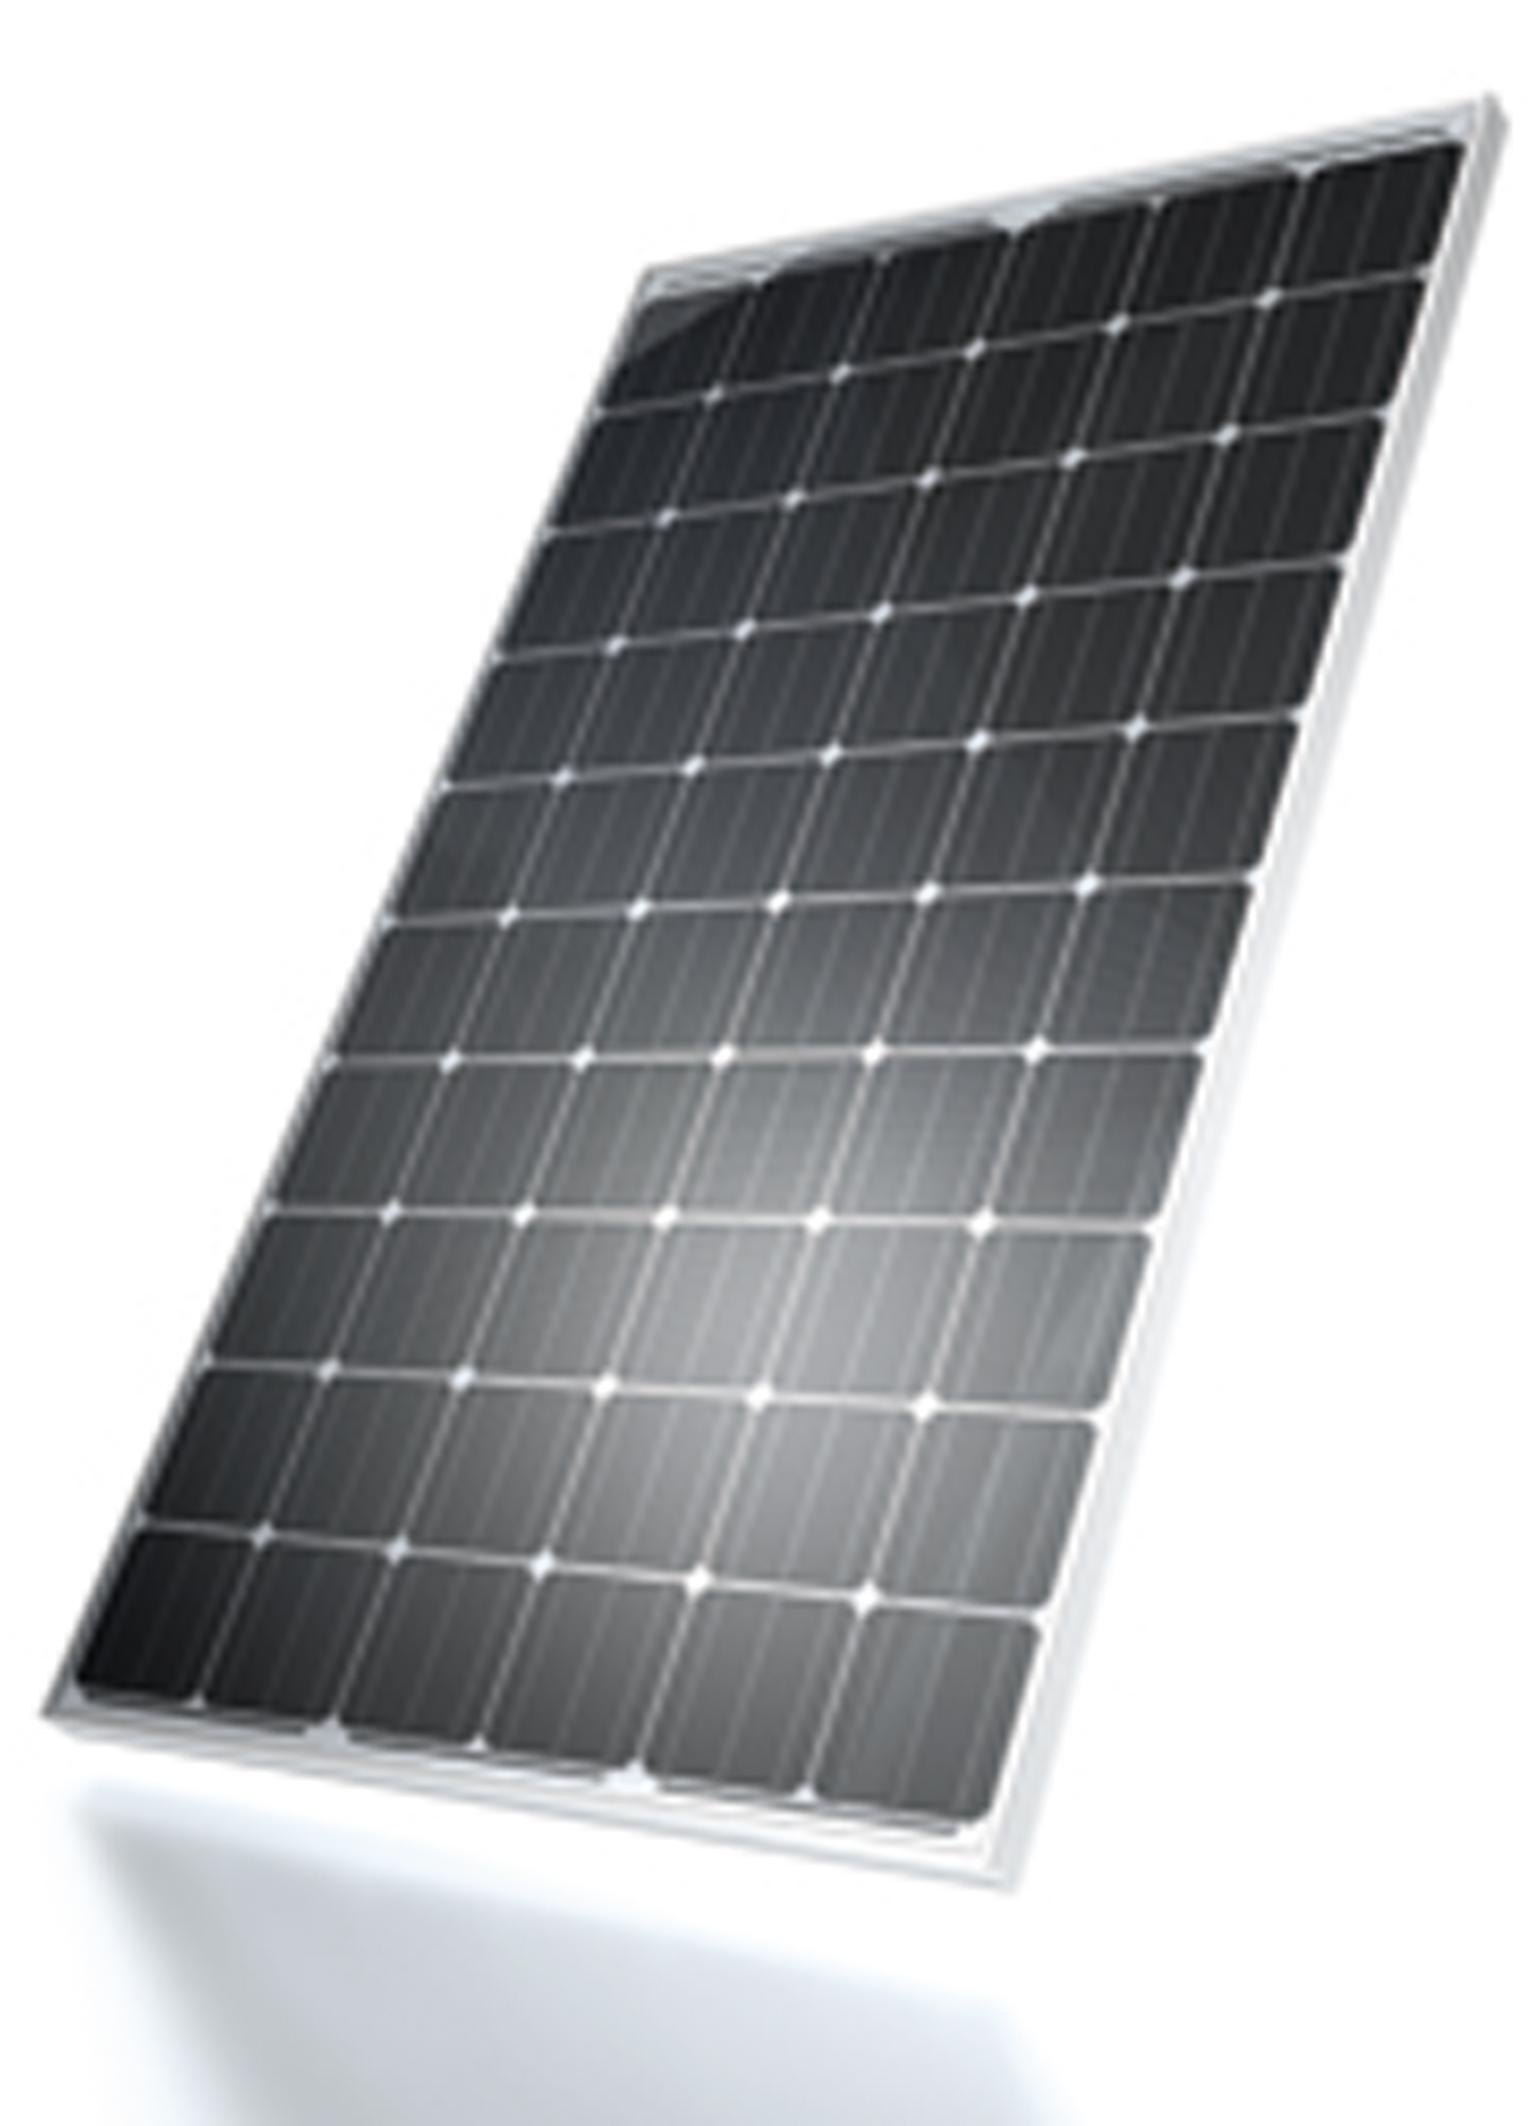 pannelli solari prezzi part 3